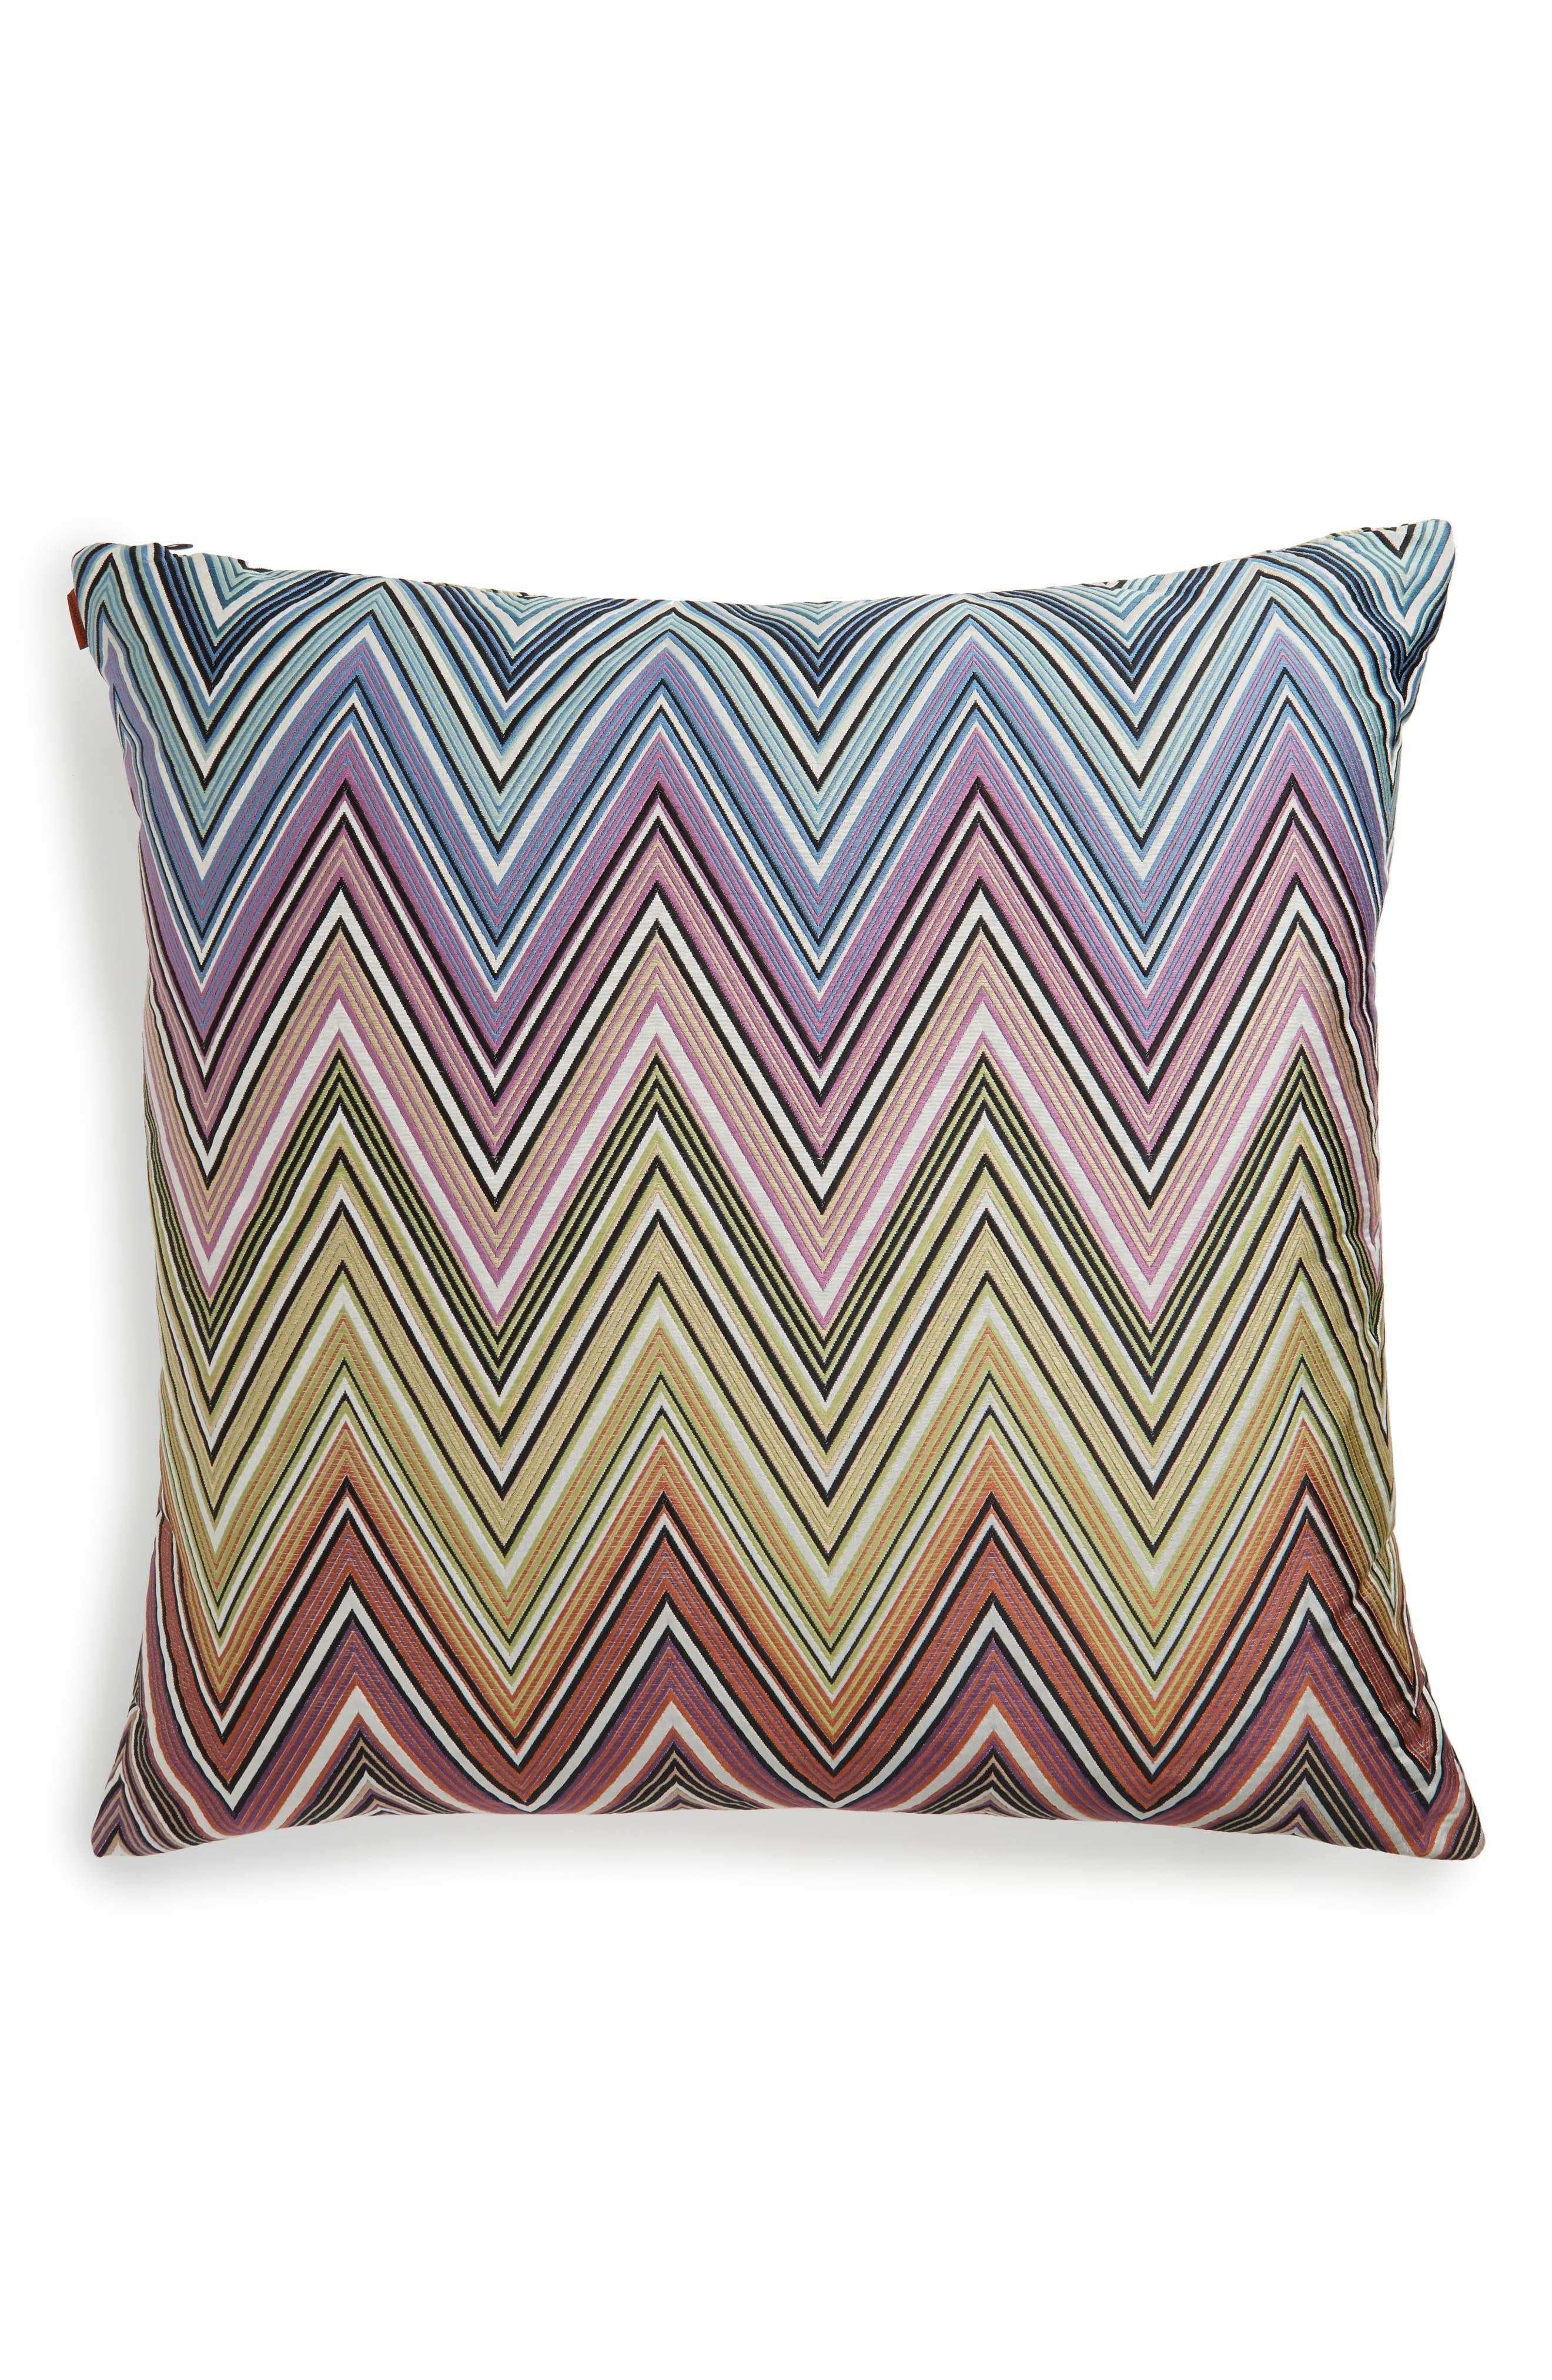 Main Image - Missoni Kew Accent Pillow